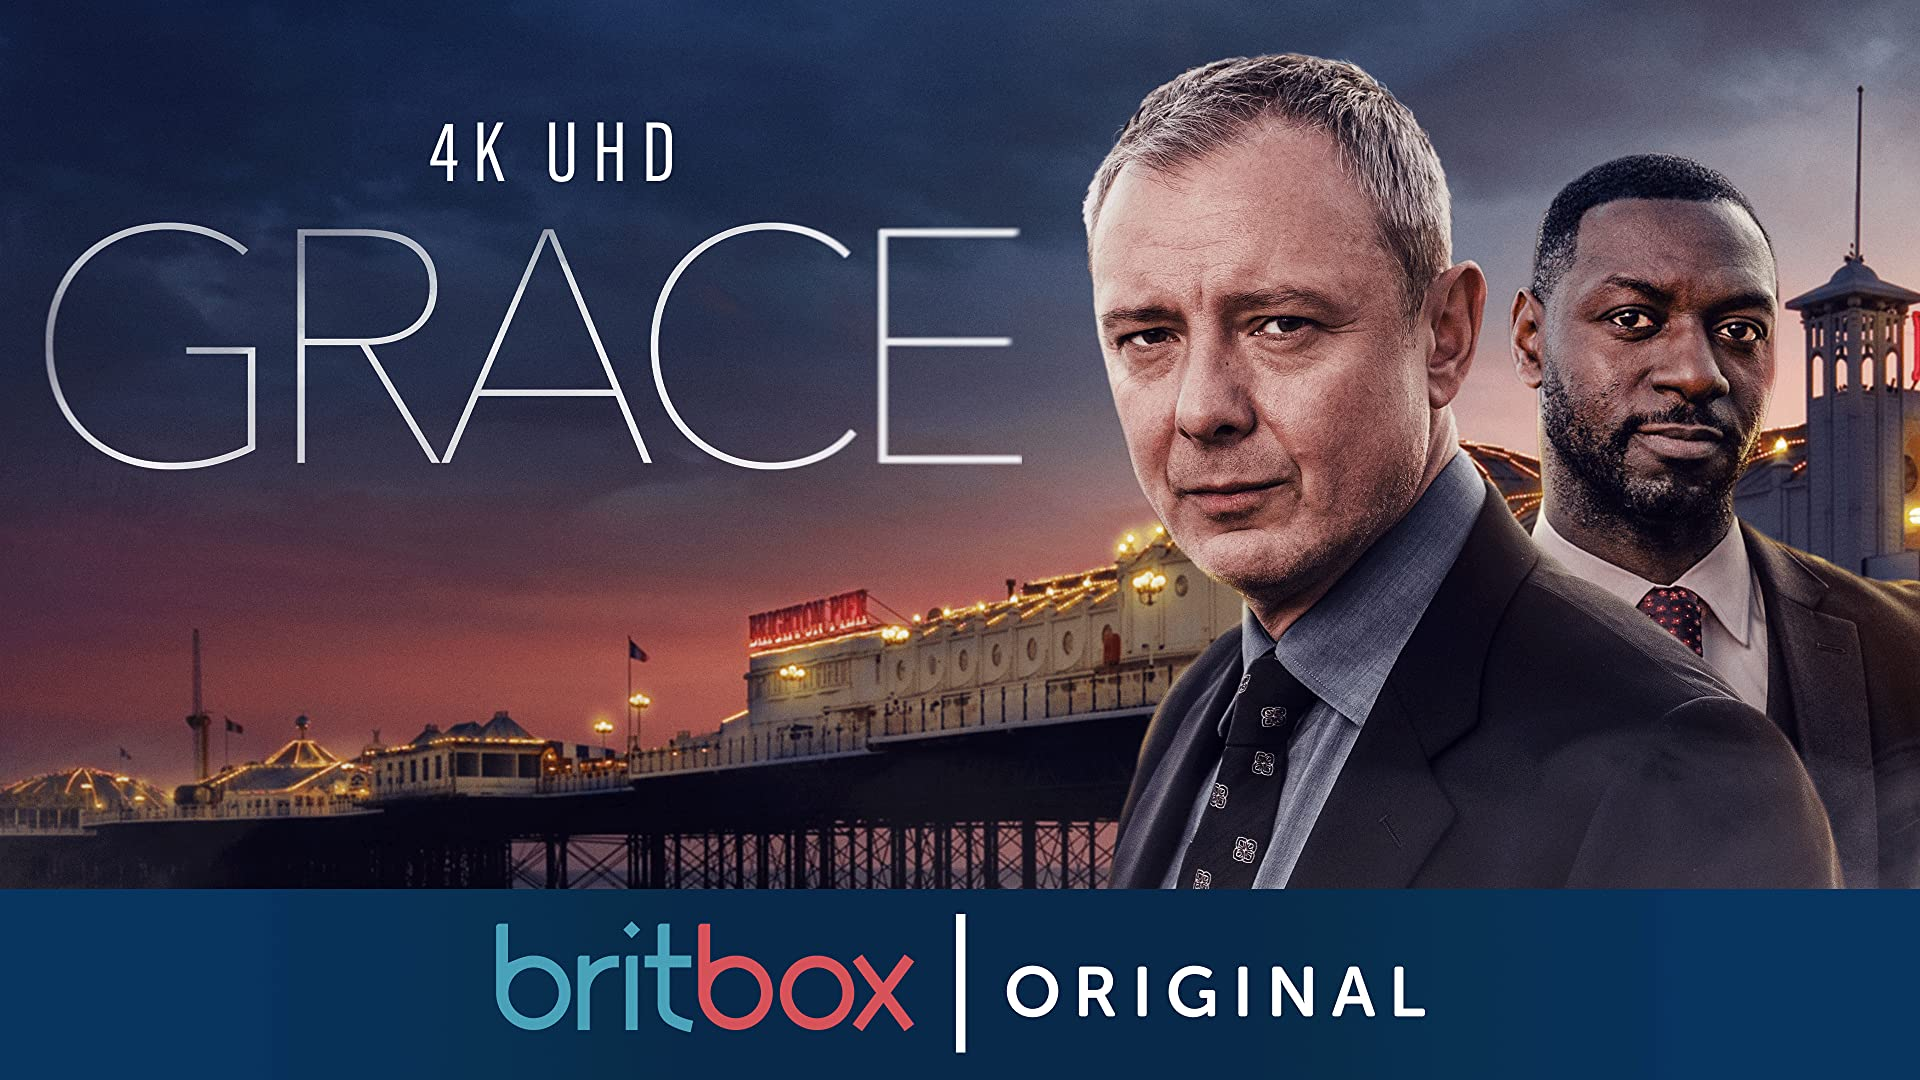 Grace (4K UHD)